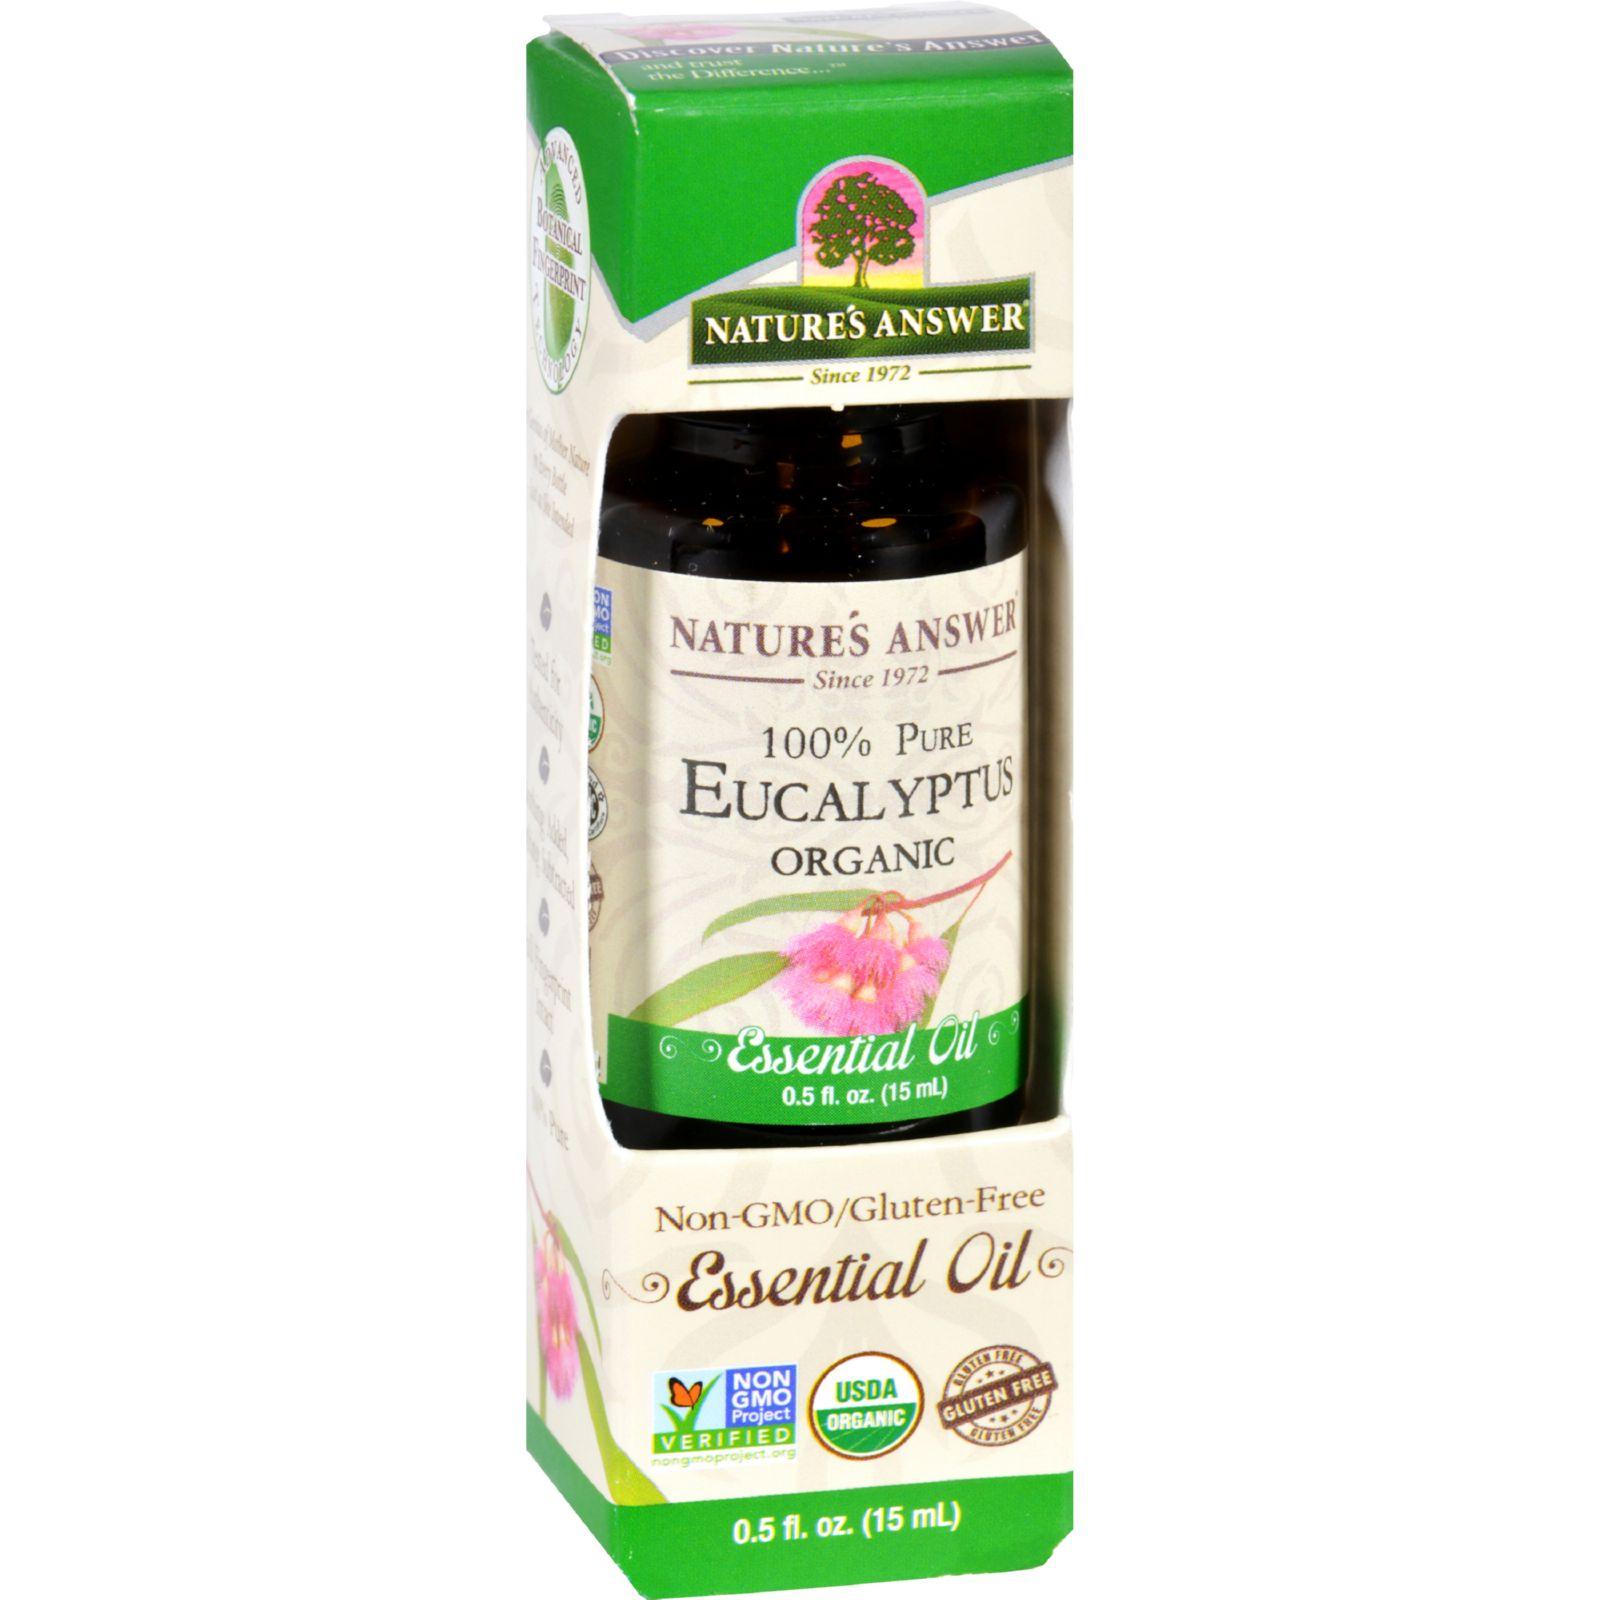 Natures Answer Essential Oil  Organic  Eucalyptus  .5 oz